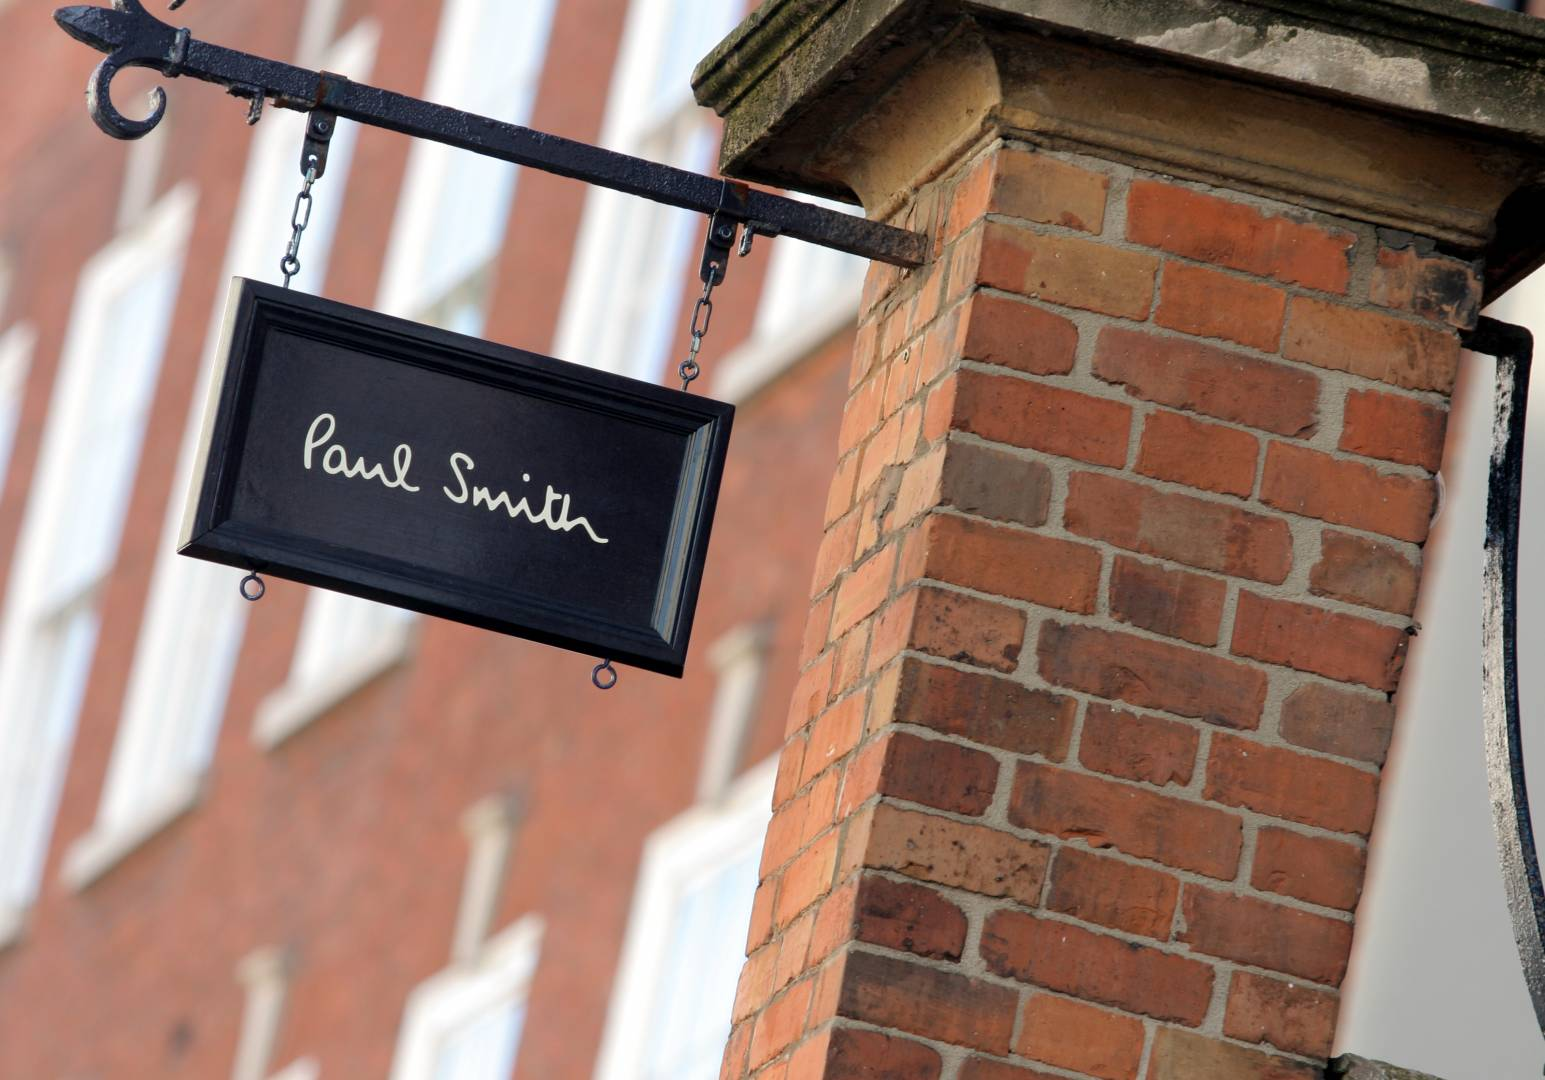 Paul Smith Nottingham